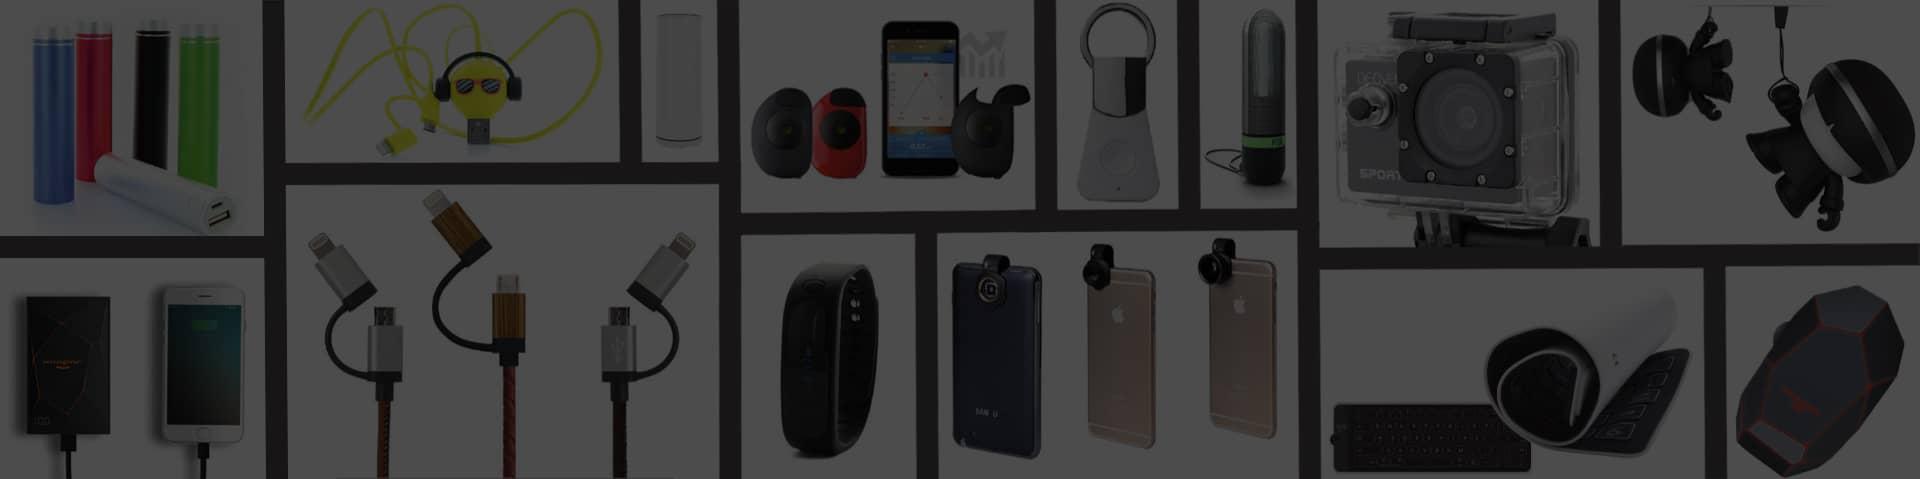 Gadget Catalogue